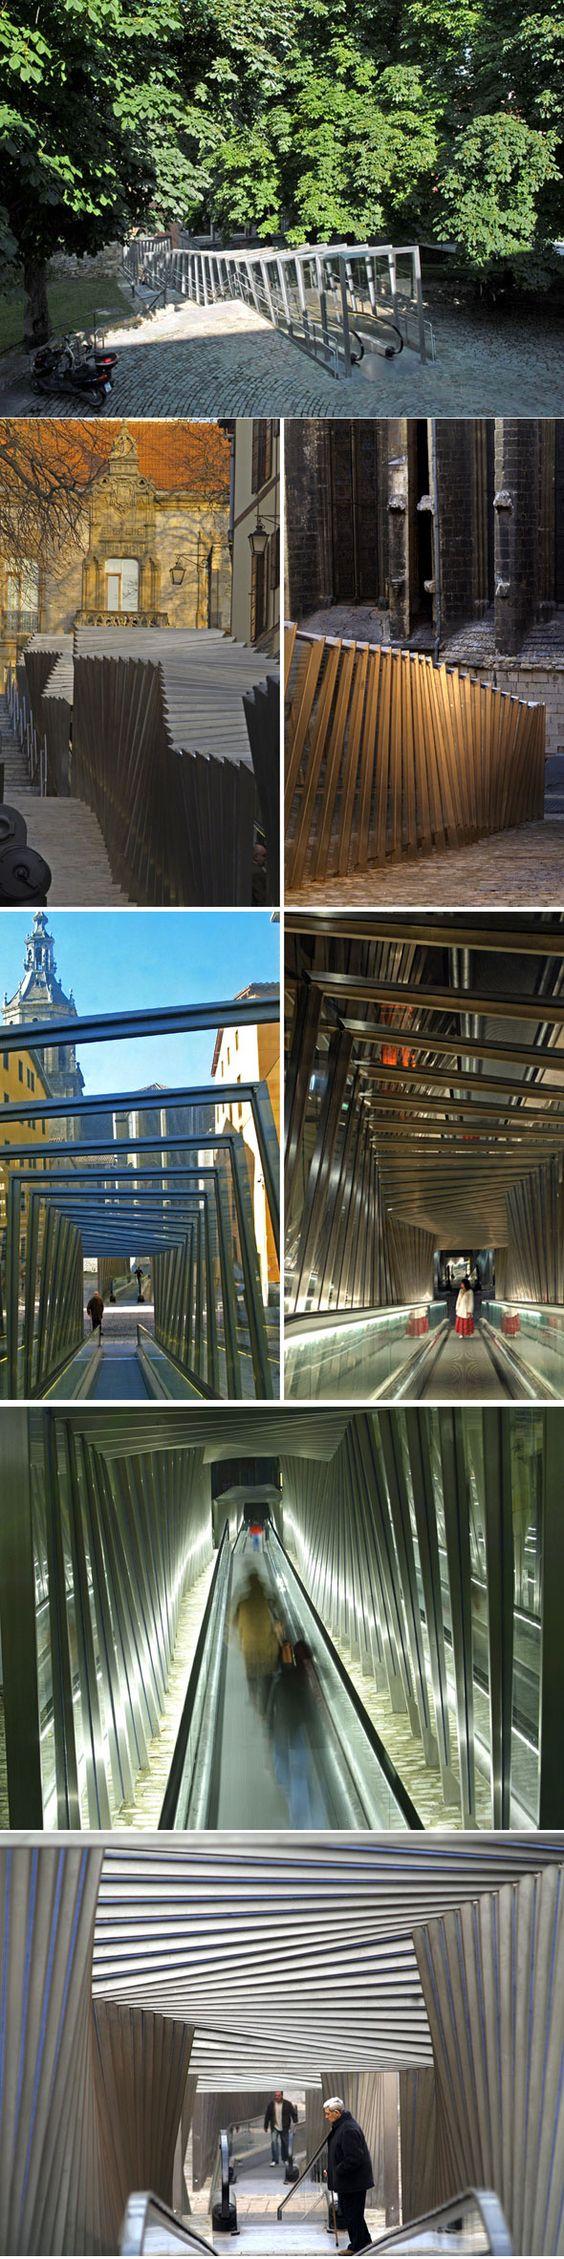 Mechanical ramps par Roberto Ercilla